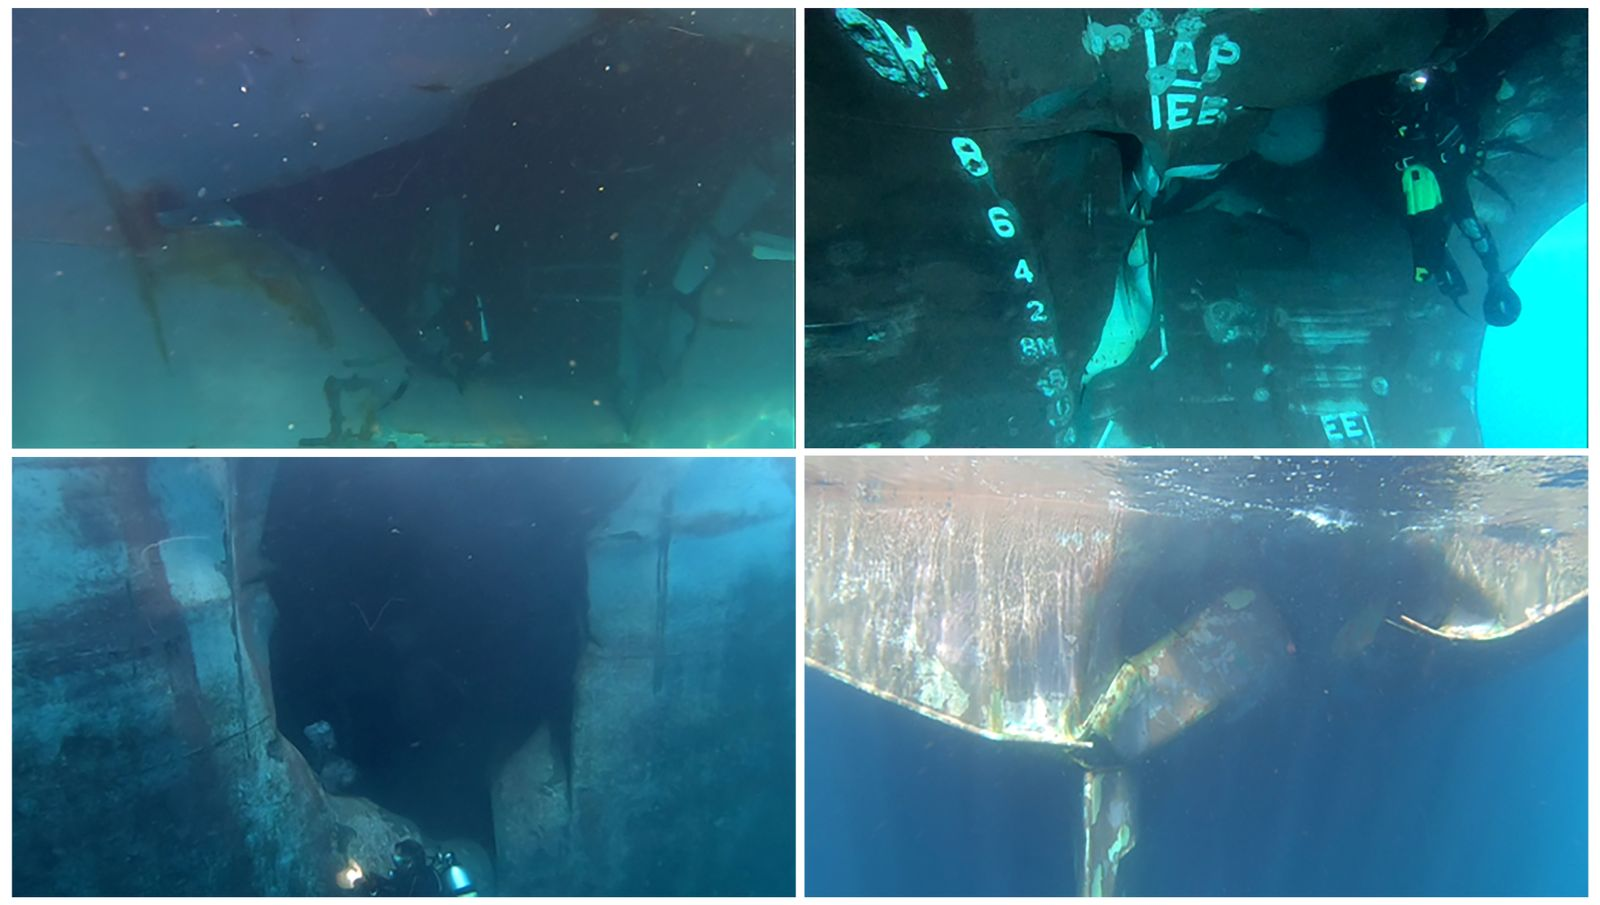 VAE/ Angriff auf Schiffe im Golf